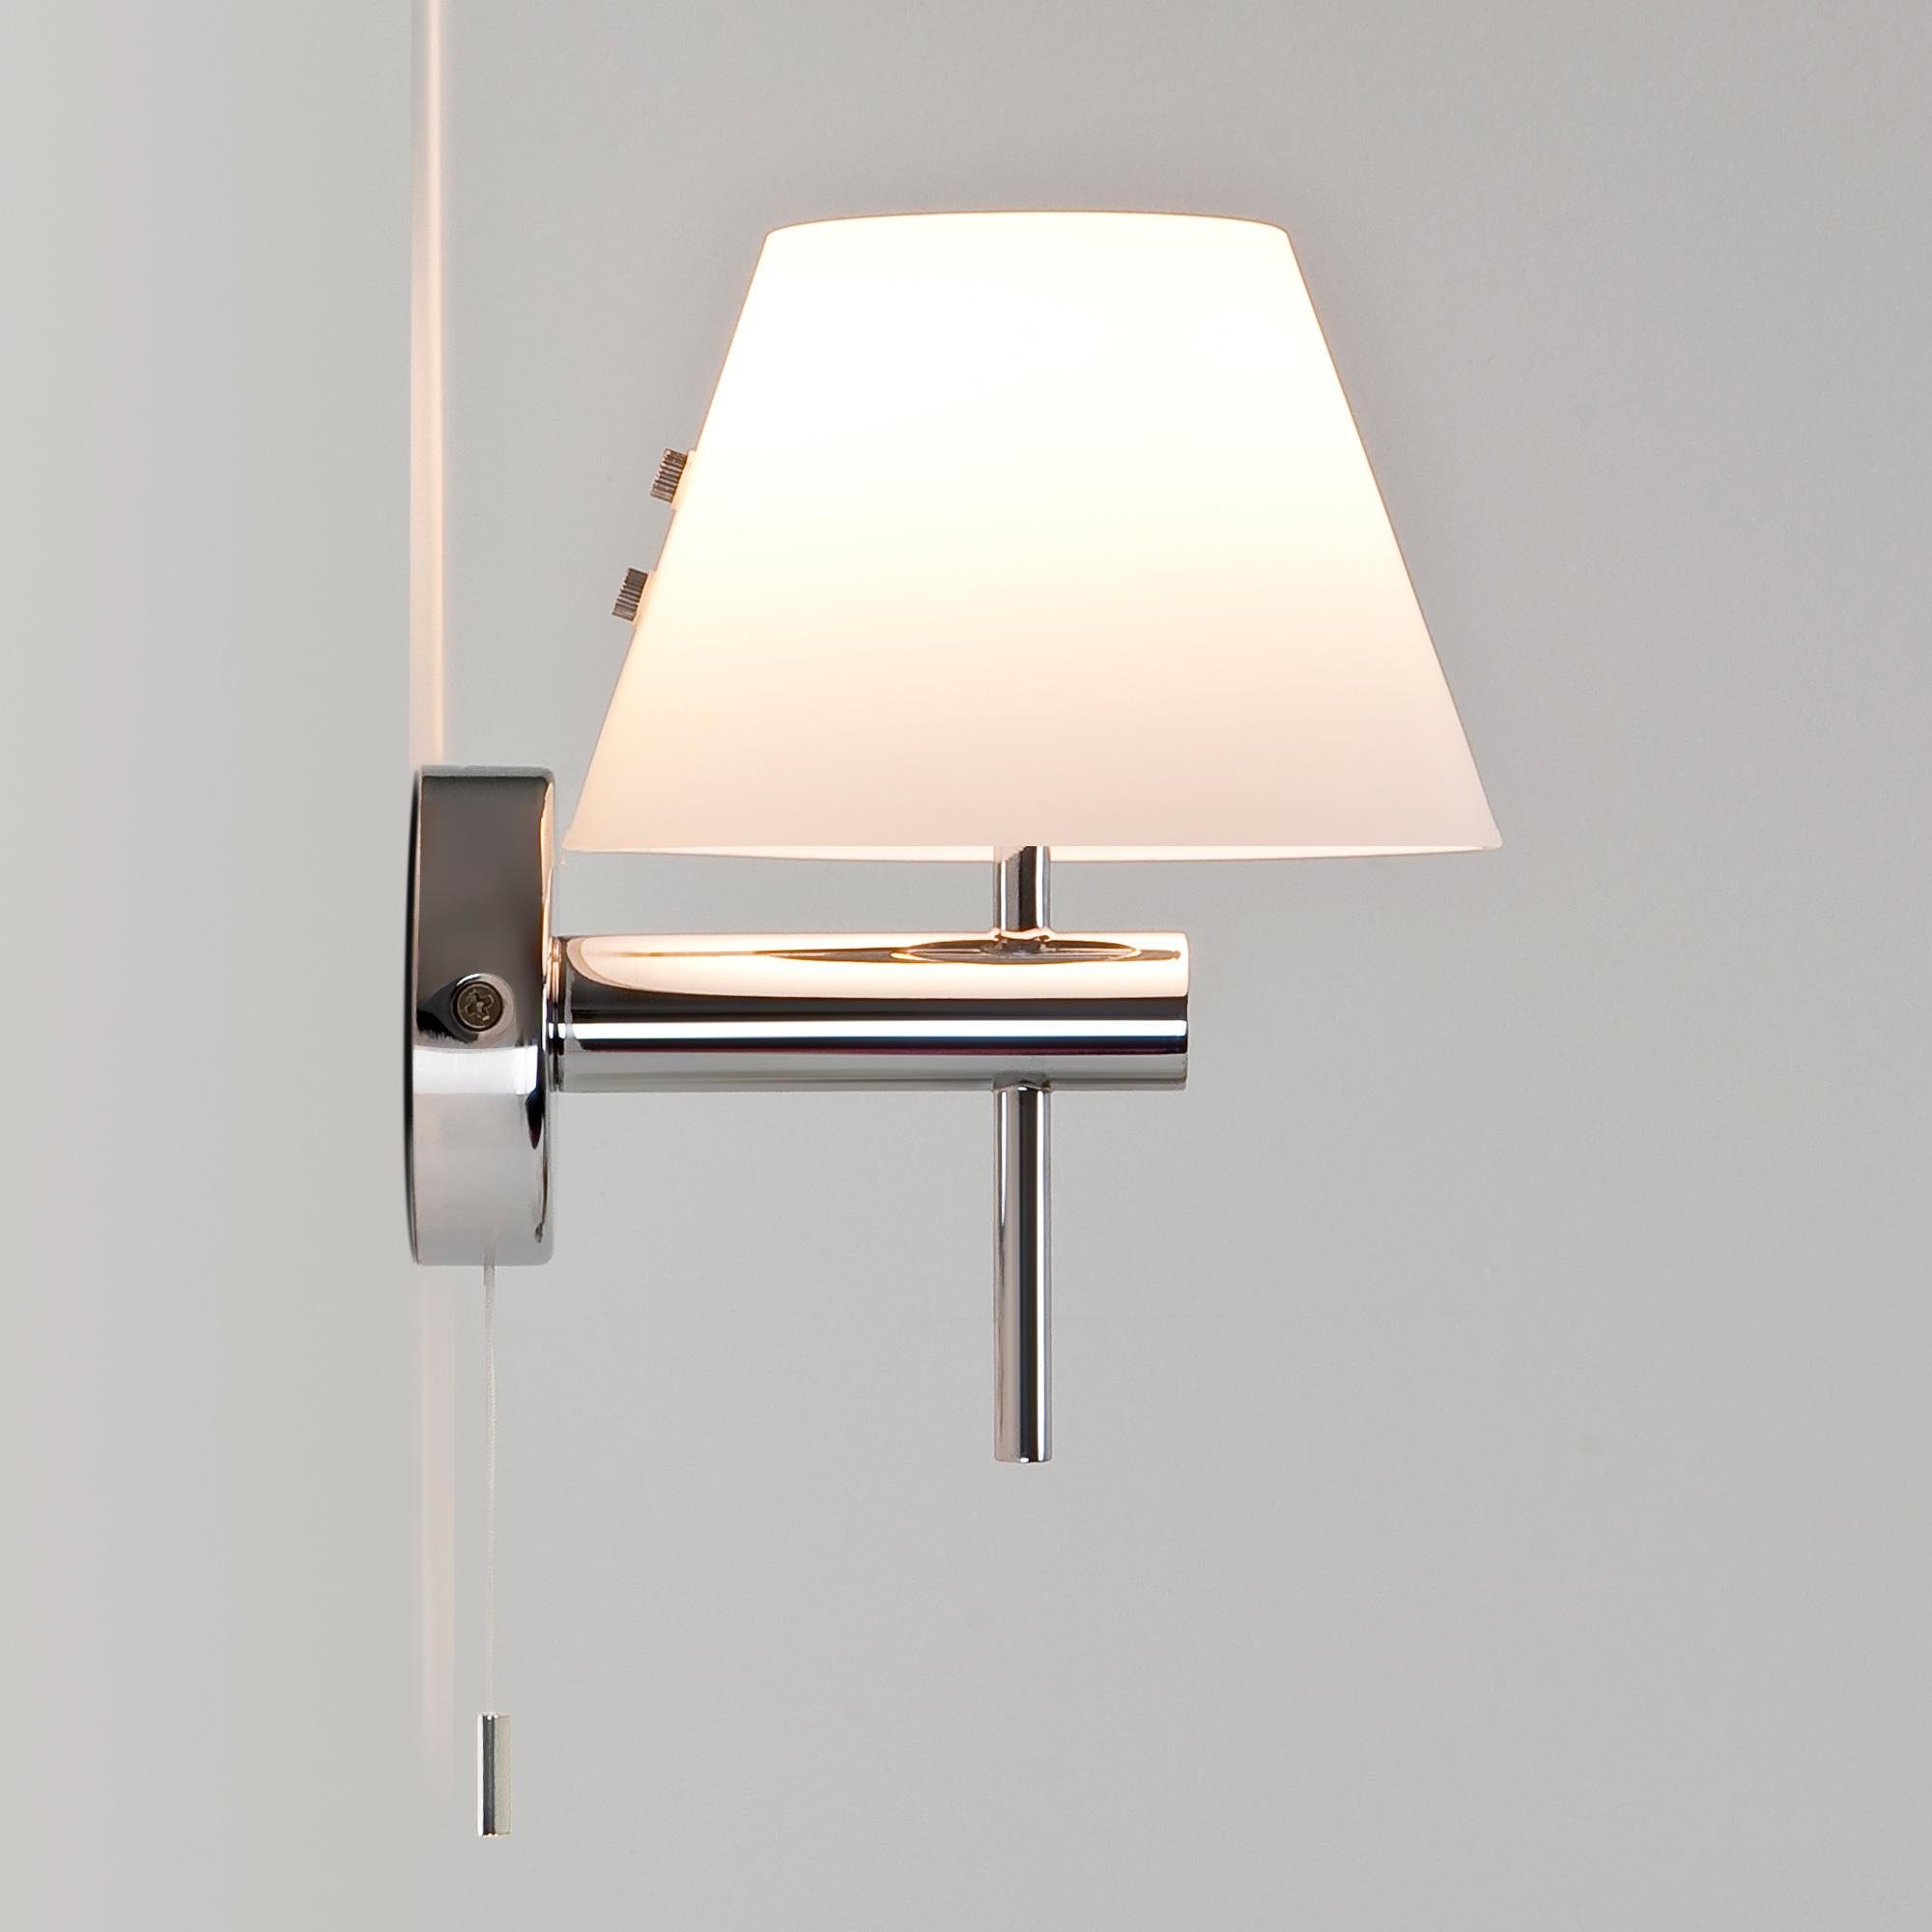 illumina astro roma wandleuchte mit schalter 0434 reuter onlineshop. Black Bedroom Furniture Sets. Home Design Ideas